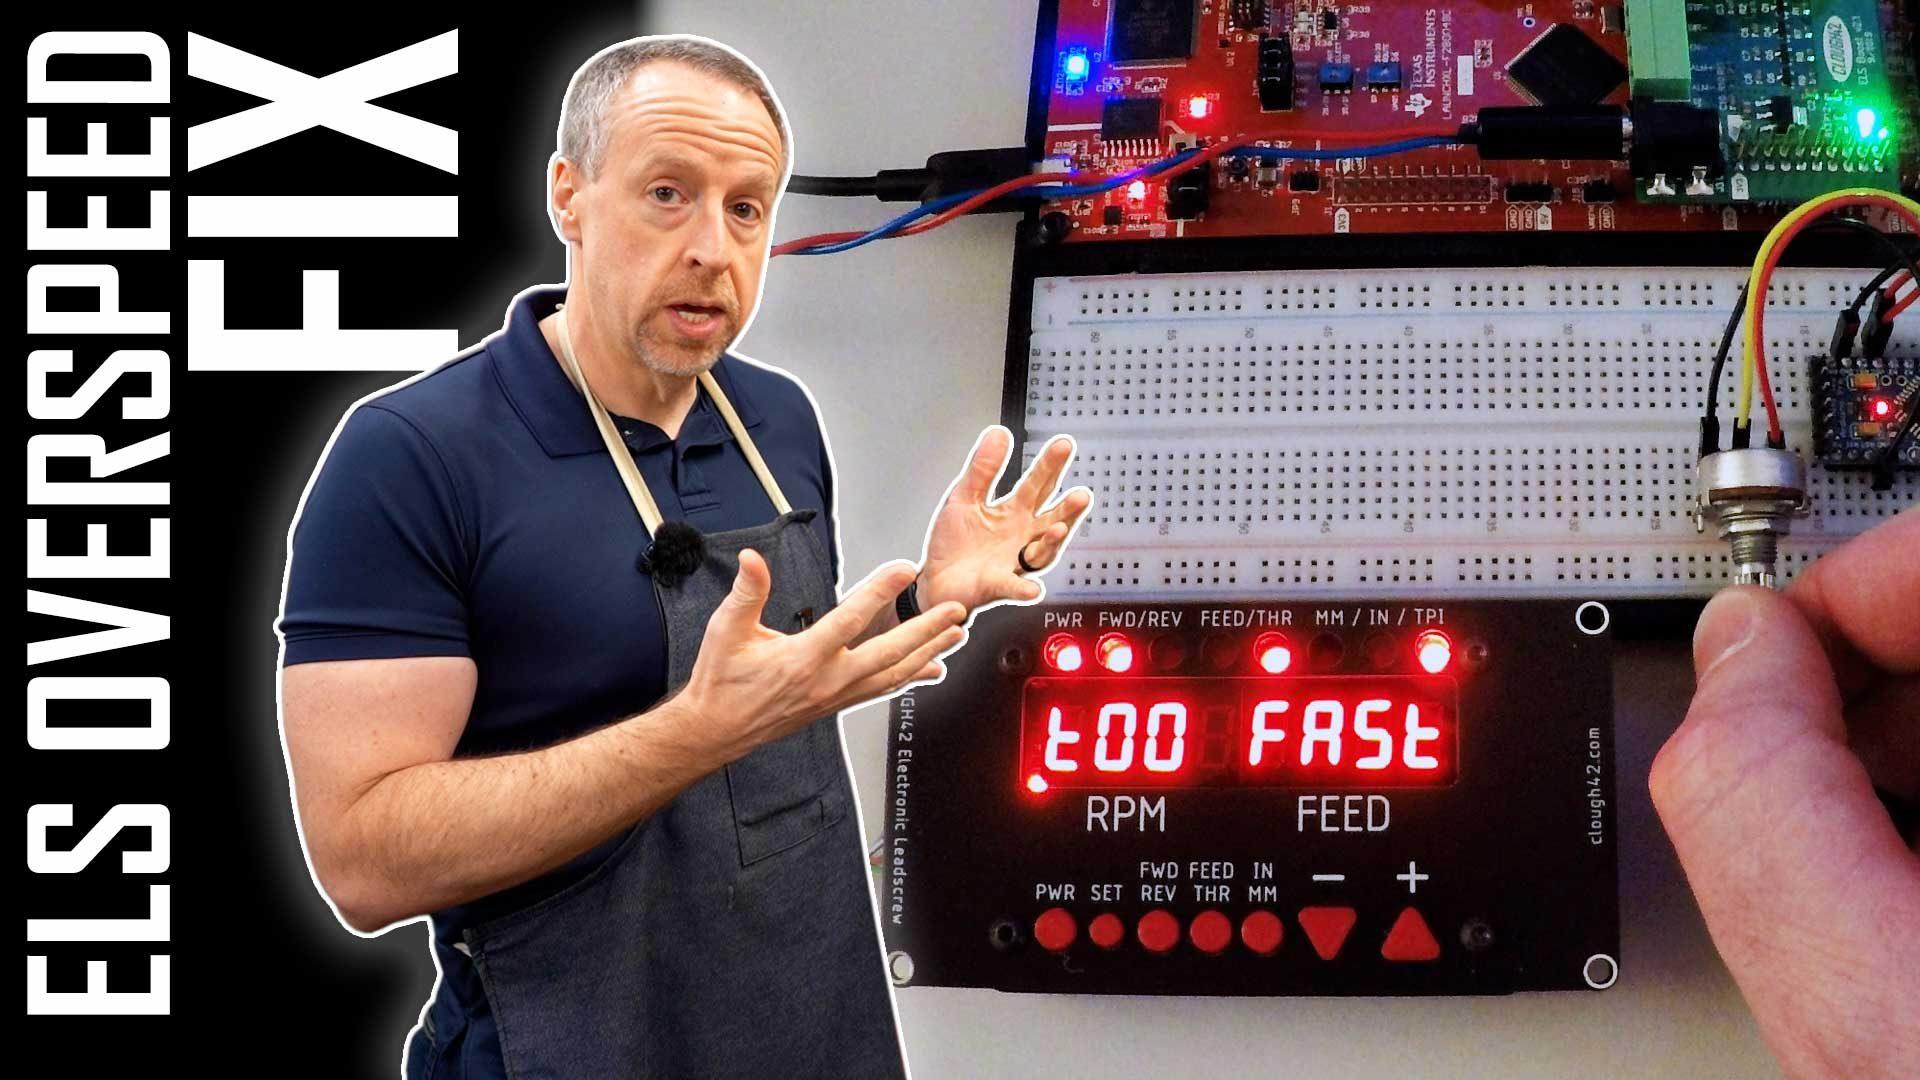 Overspeed Error Detection | Lathe Electronic Leadscrew – Part 21